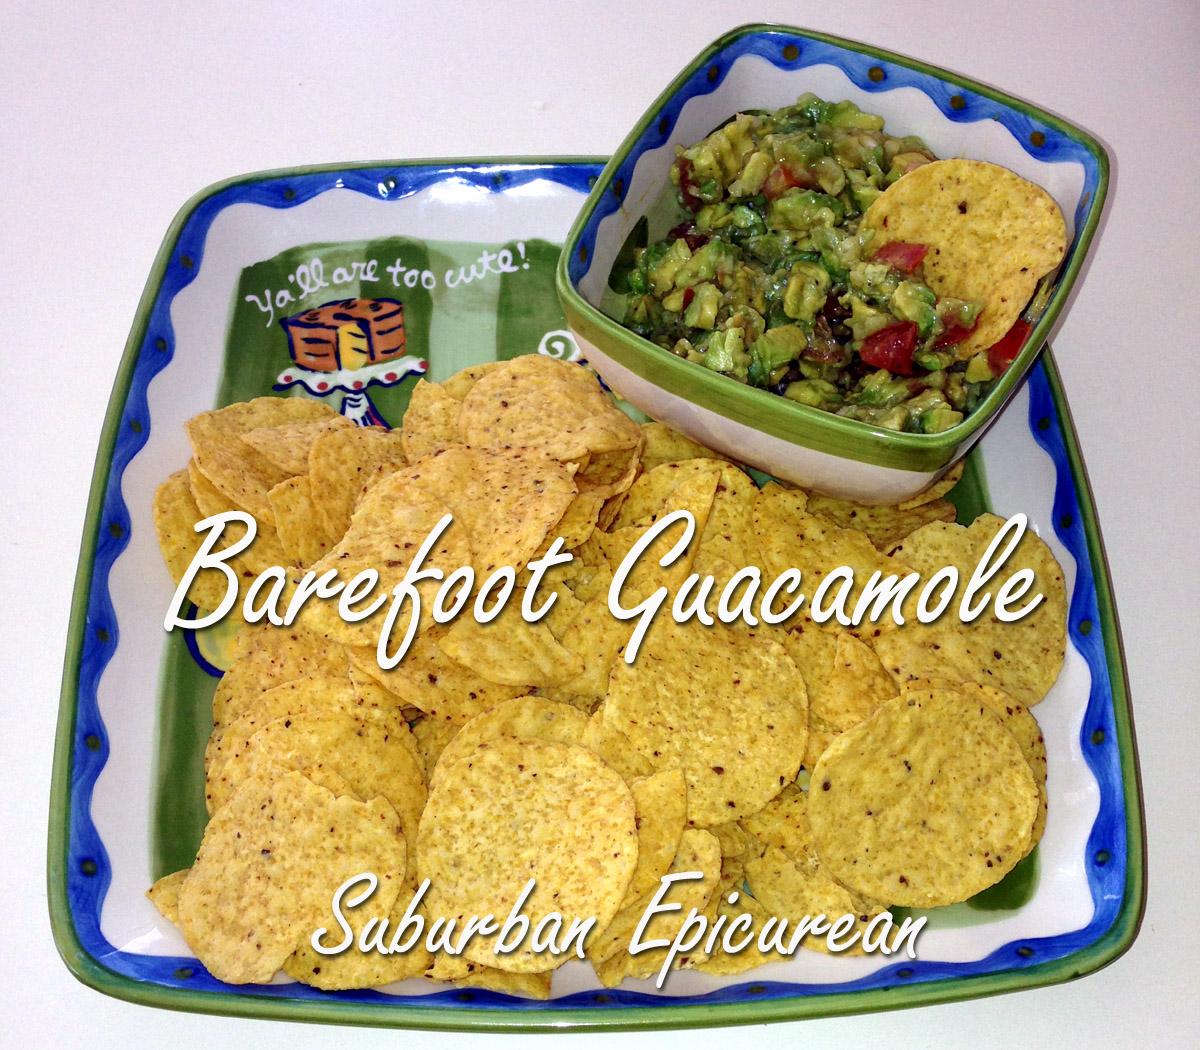 http://suburbanepicurean.blogspot.com/2013/03/guacamole.html